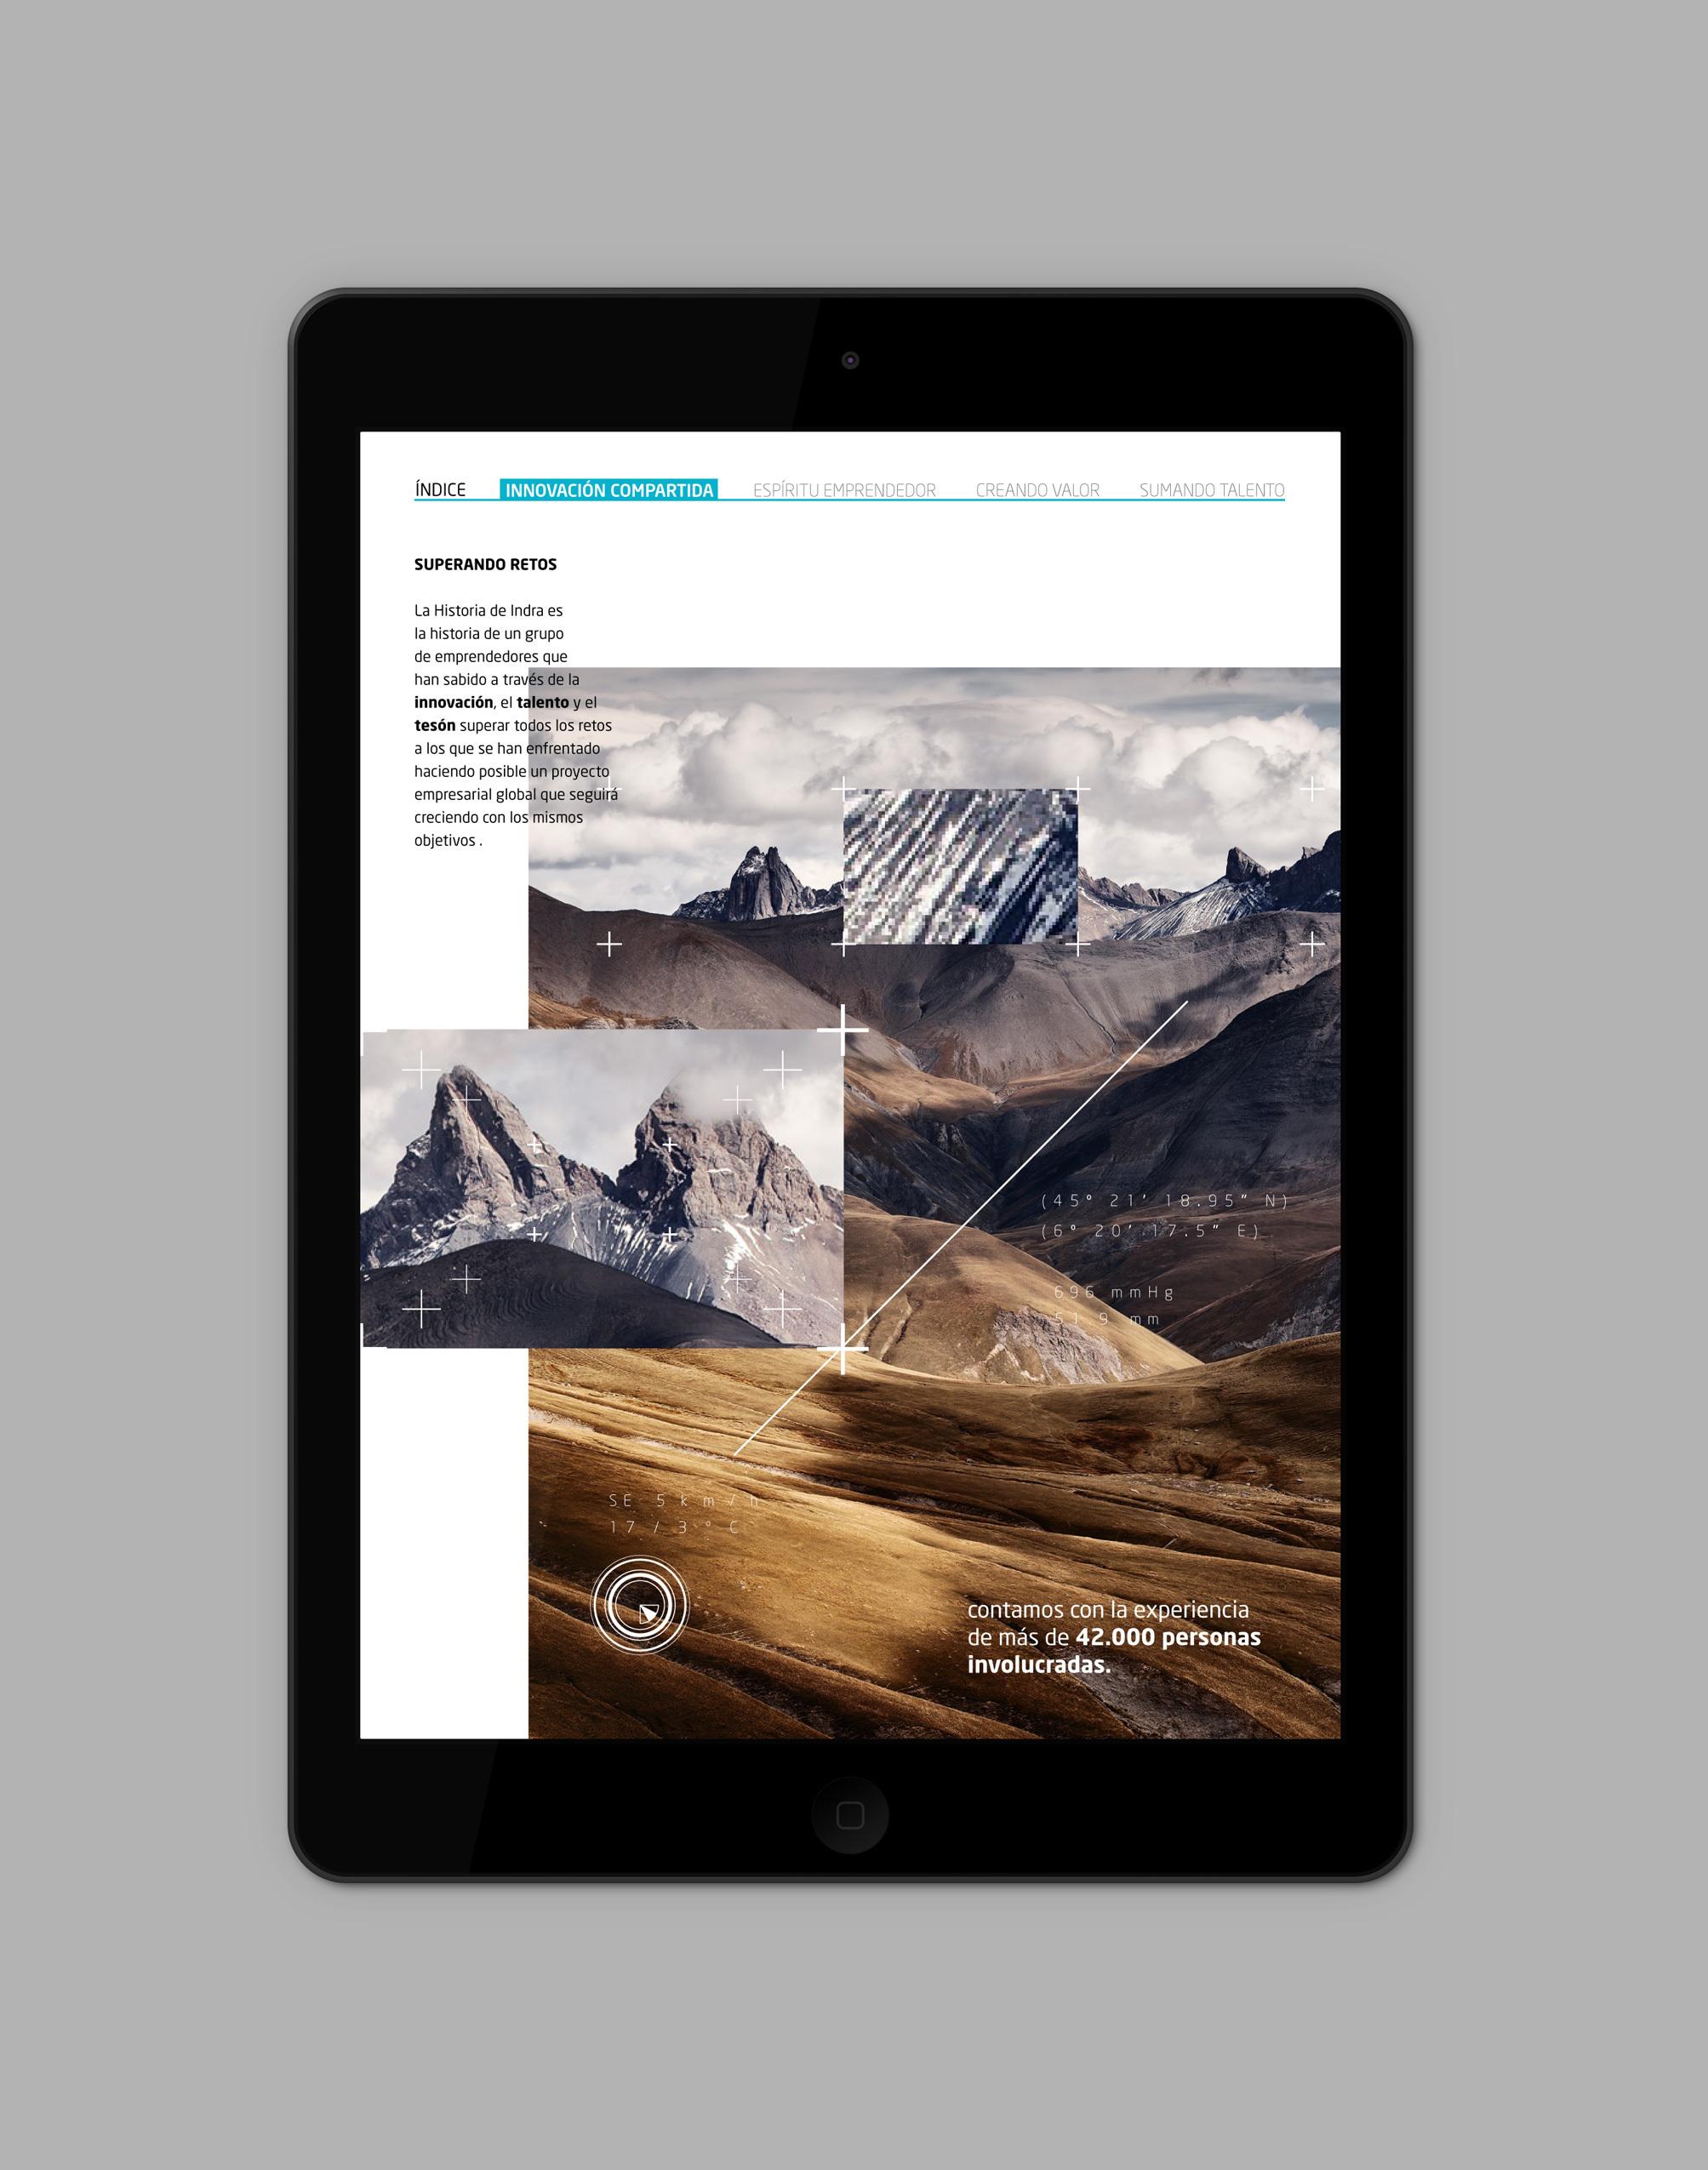 iPad-Air_Indra04.jpg